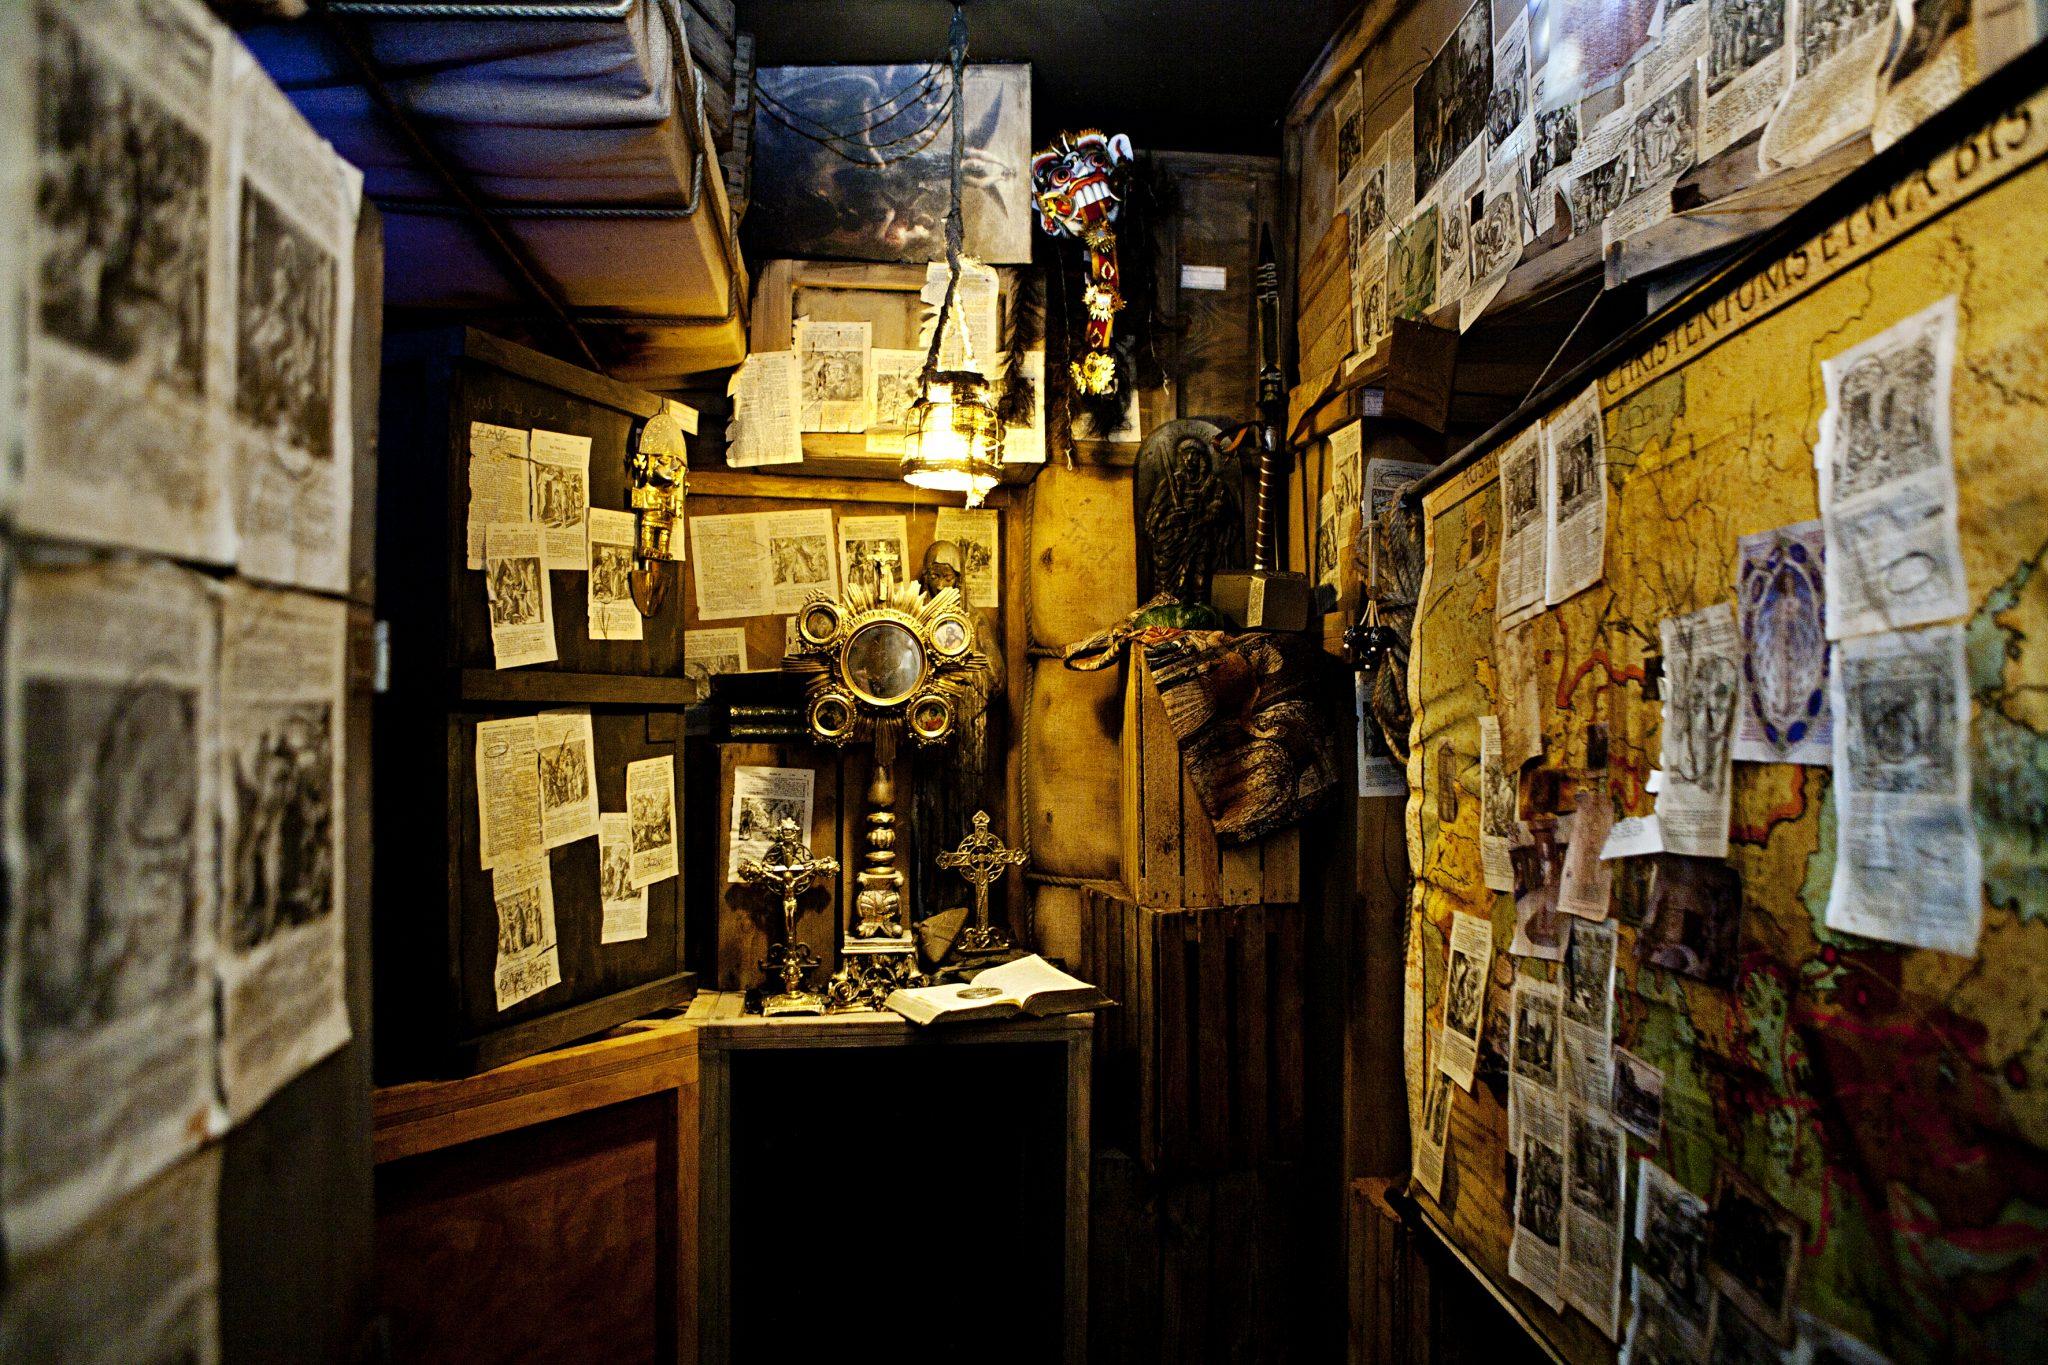 Die Besten Escape Room Anbieter In Berlin Escape Maniac